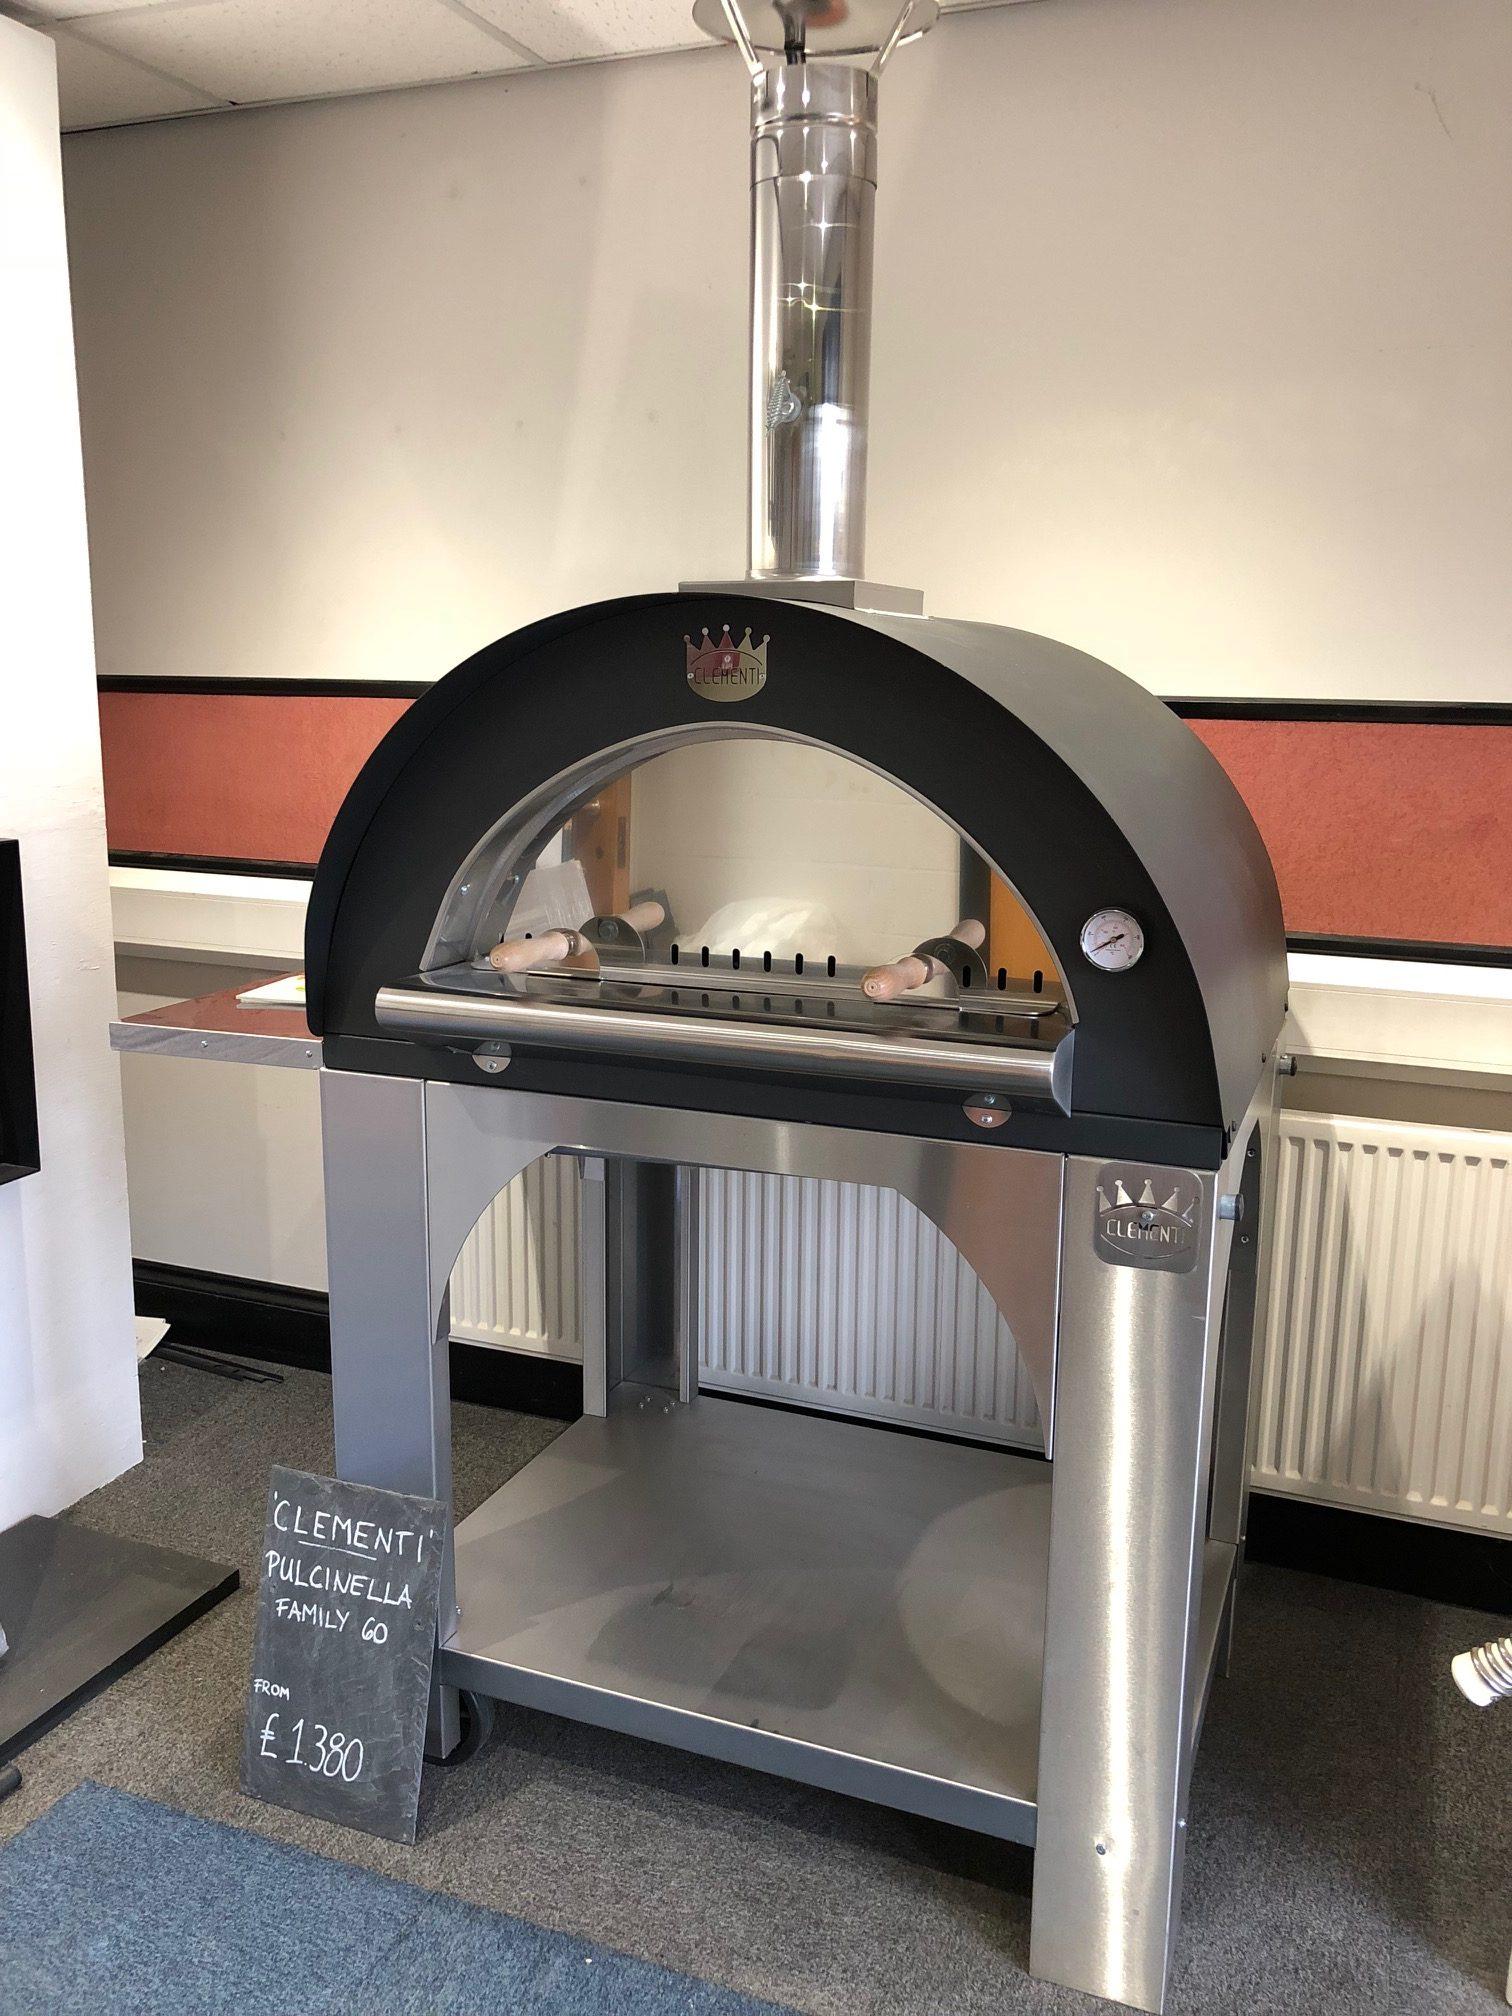 Clementi Pulcinella Pizza Oven 80 X 60cm Ex Display Unused